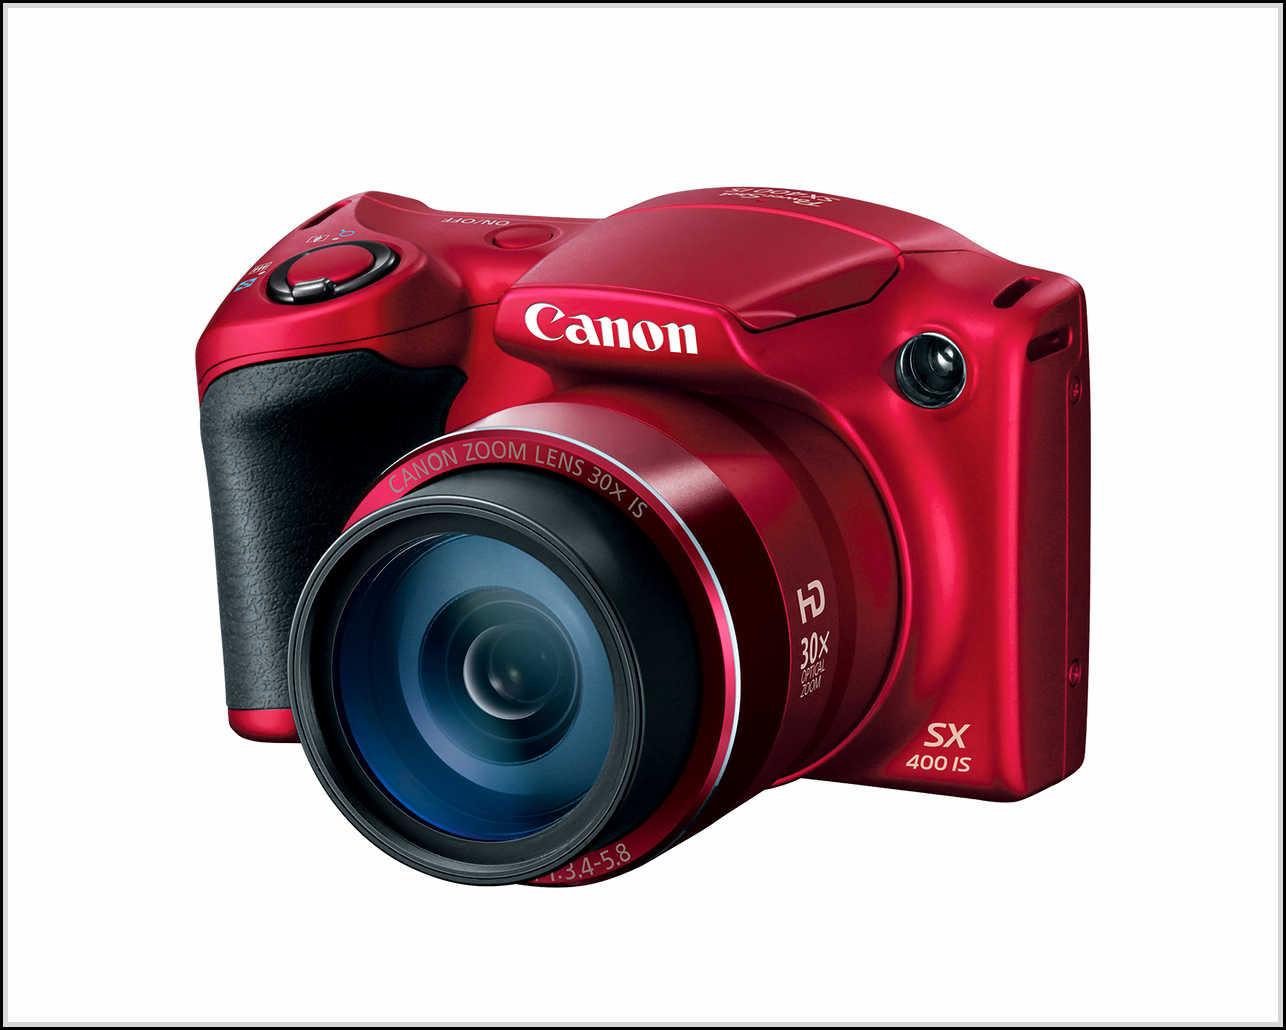 kamera canon powershot terbaik